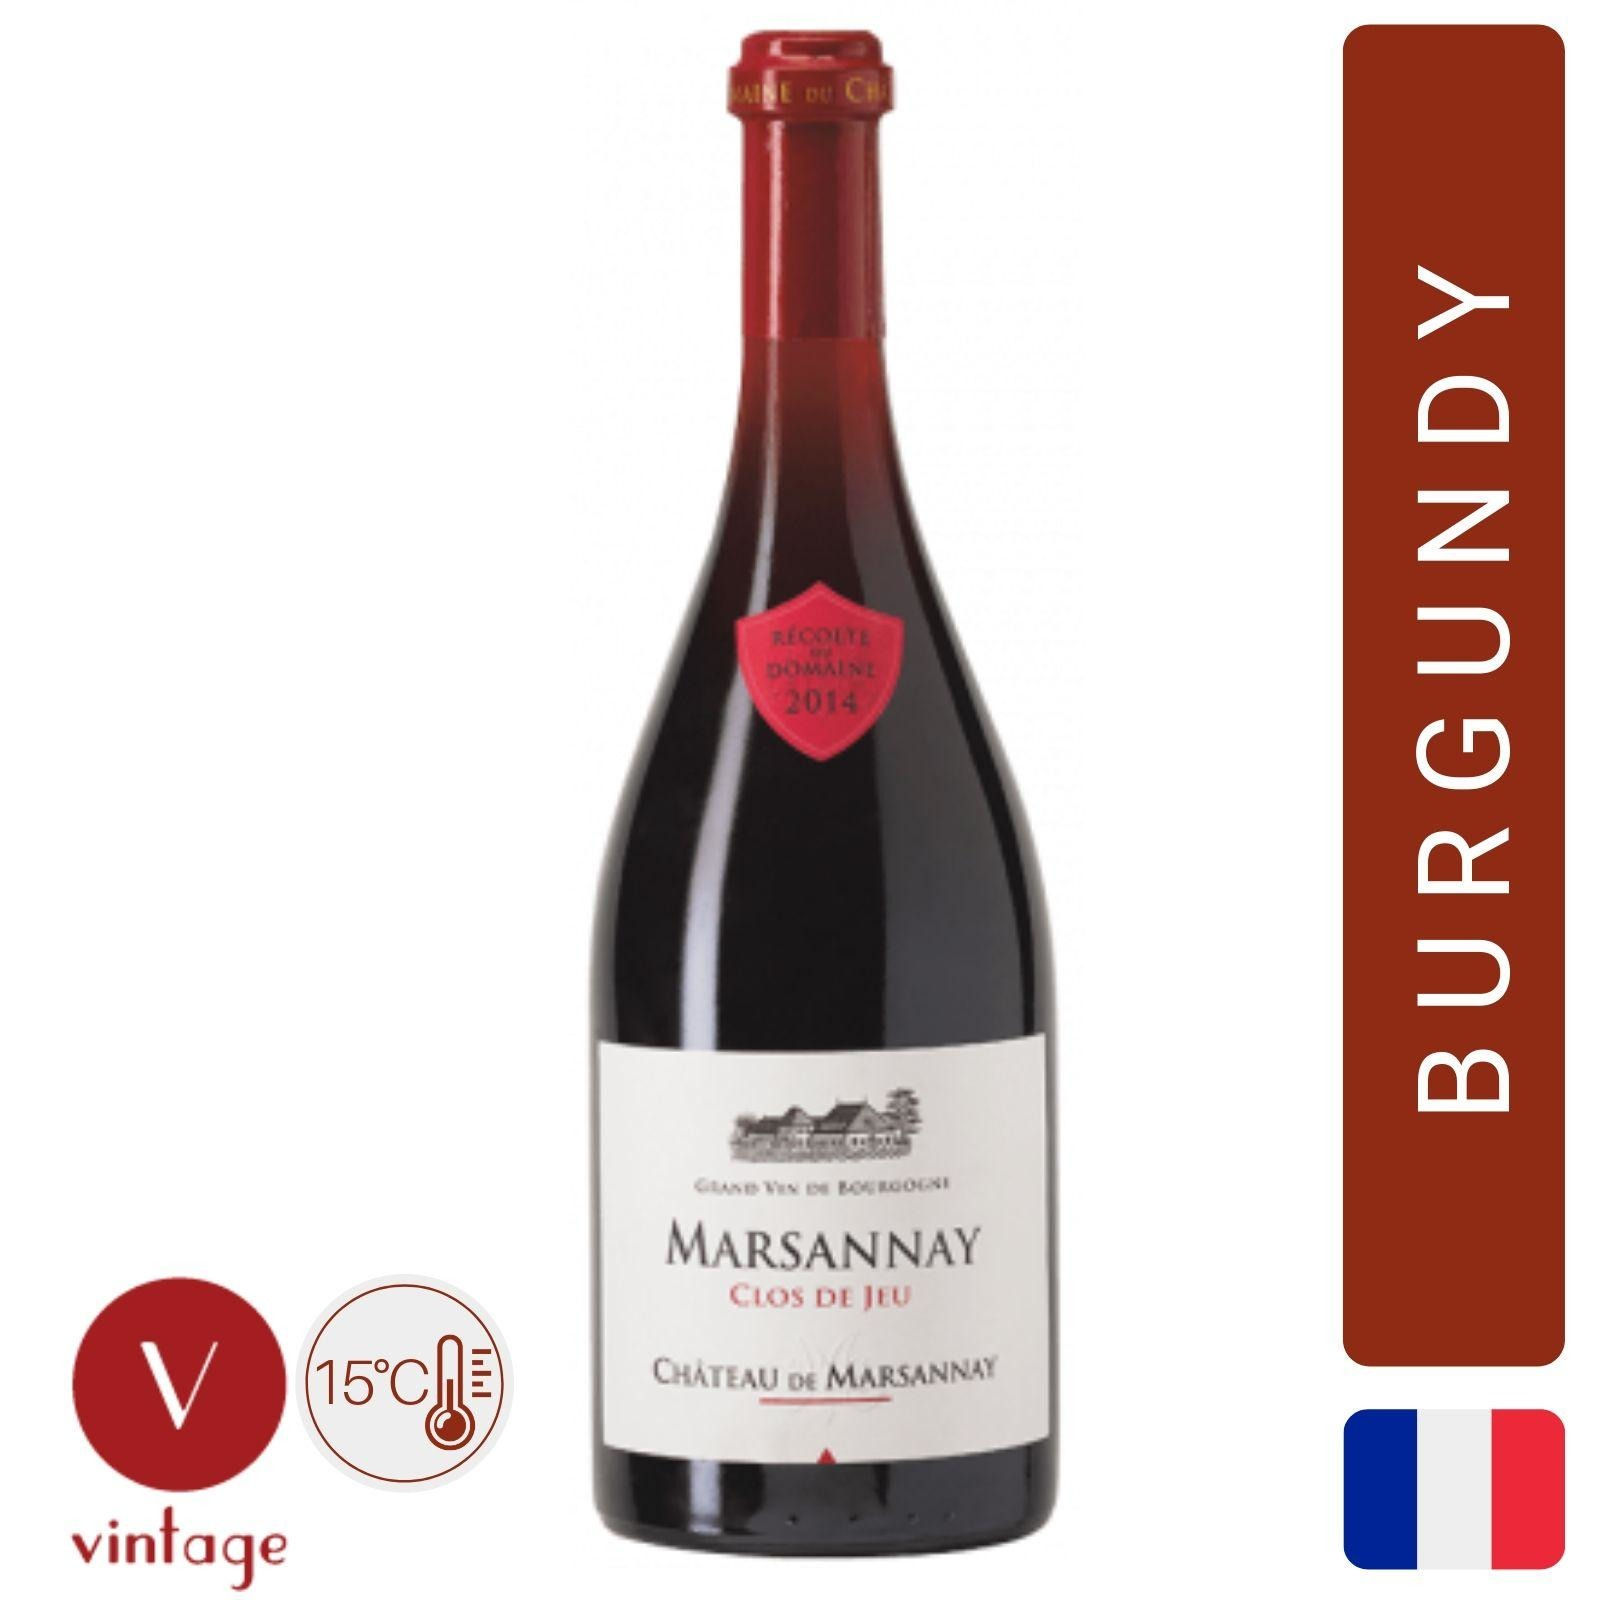 Chateau de Marsannay - Clos de Jeu - Burgundy Red Wine